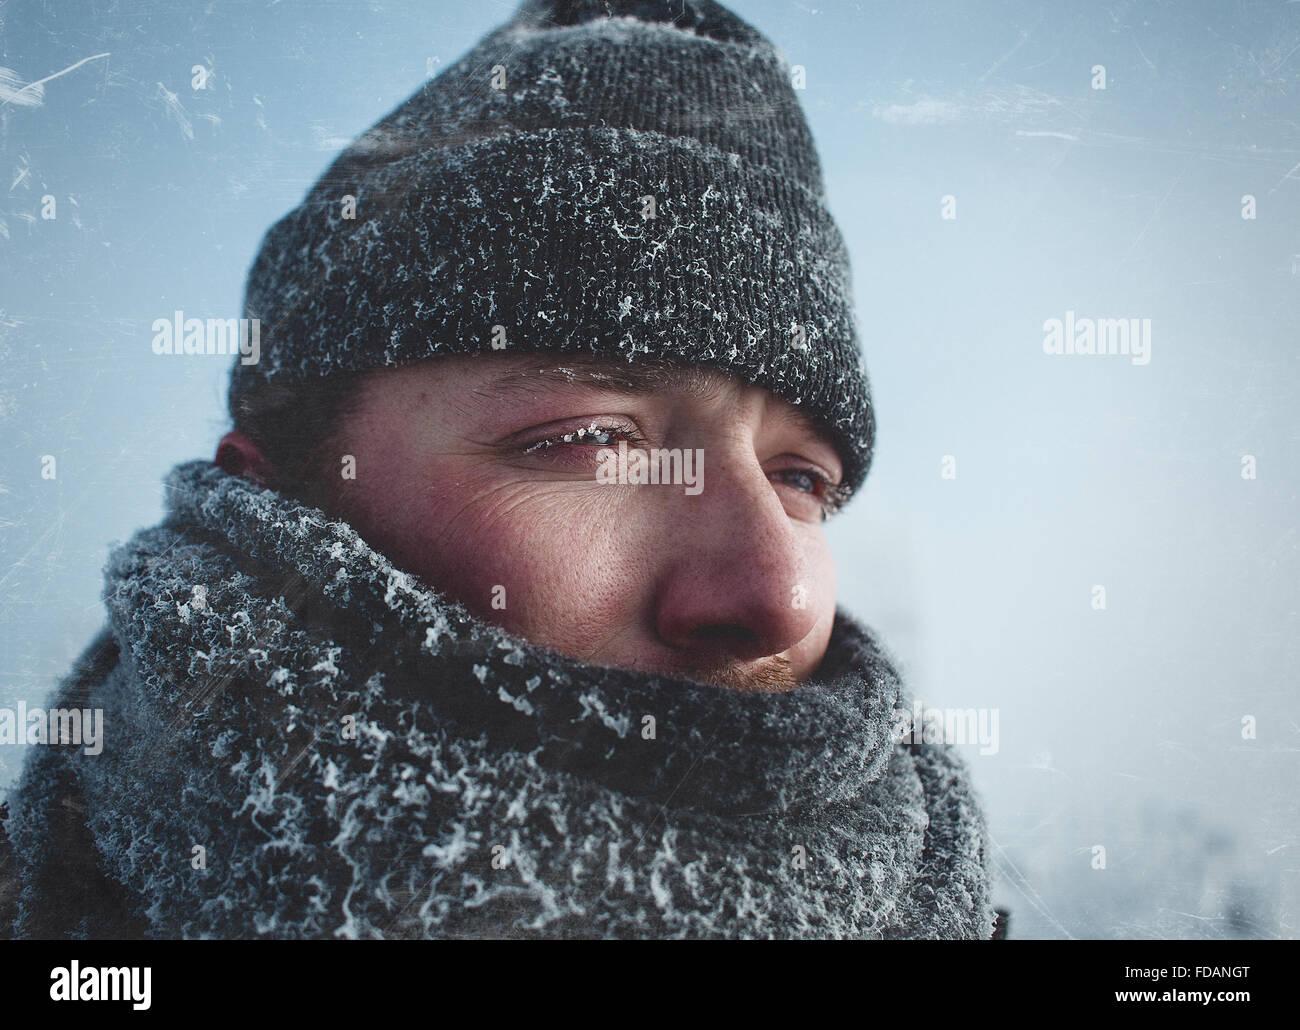 Winter Wonderland Immagini Stock